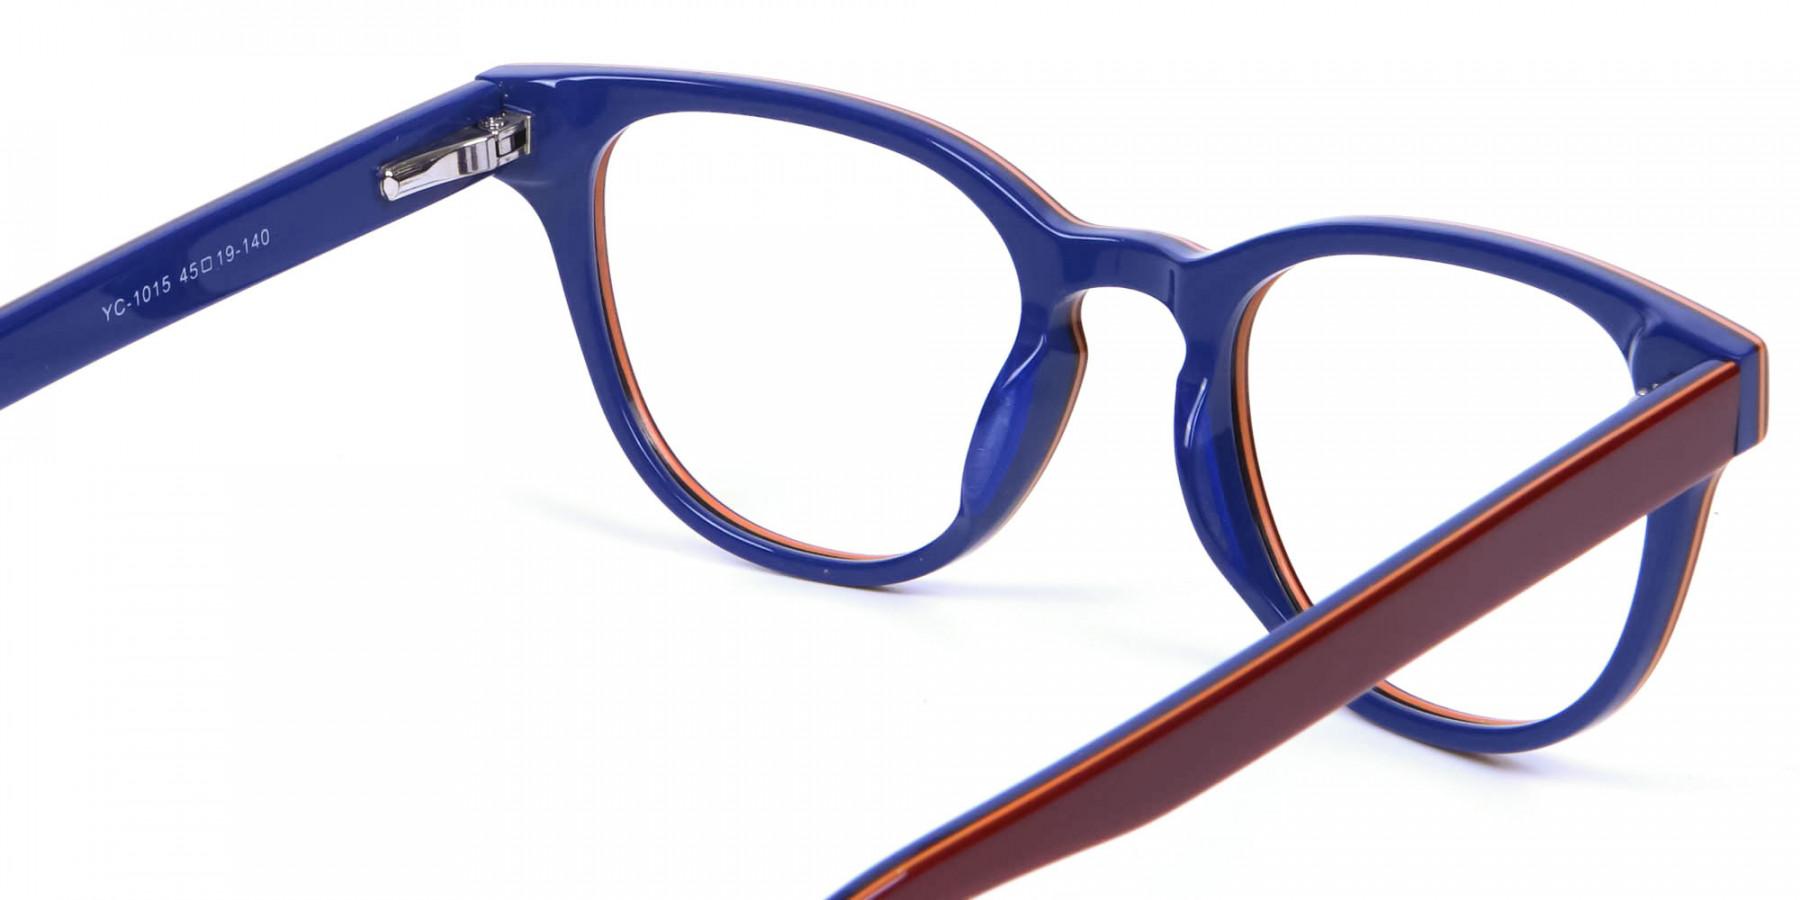 Mahogany Blue and Orange Glasses